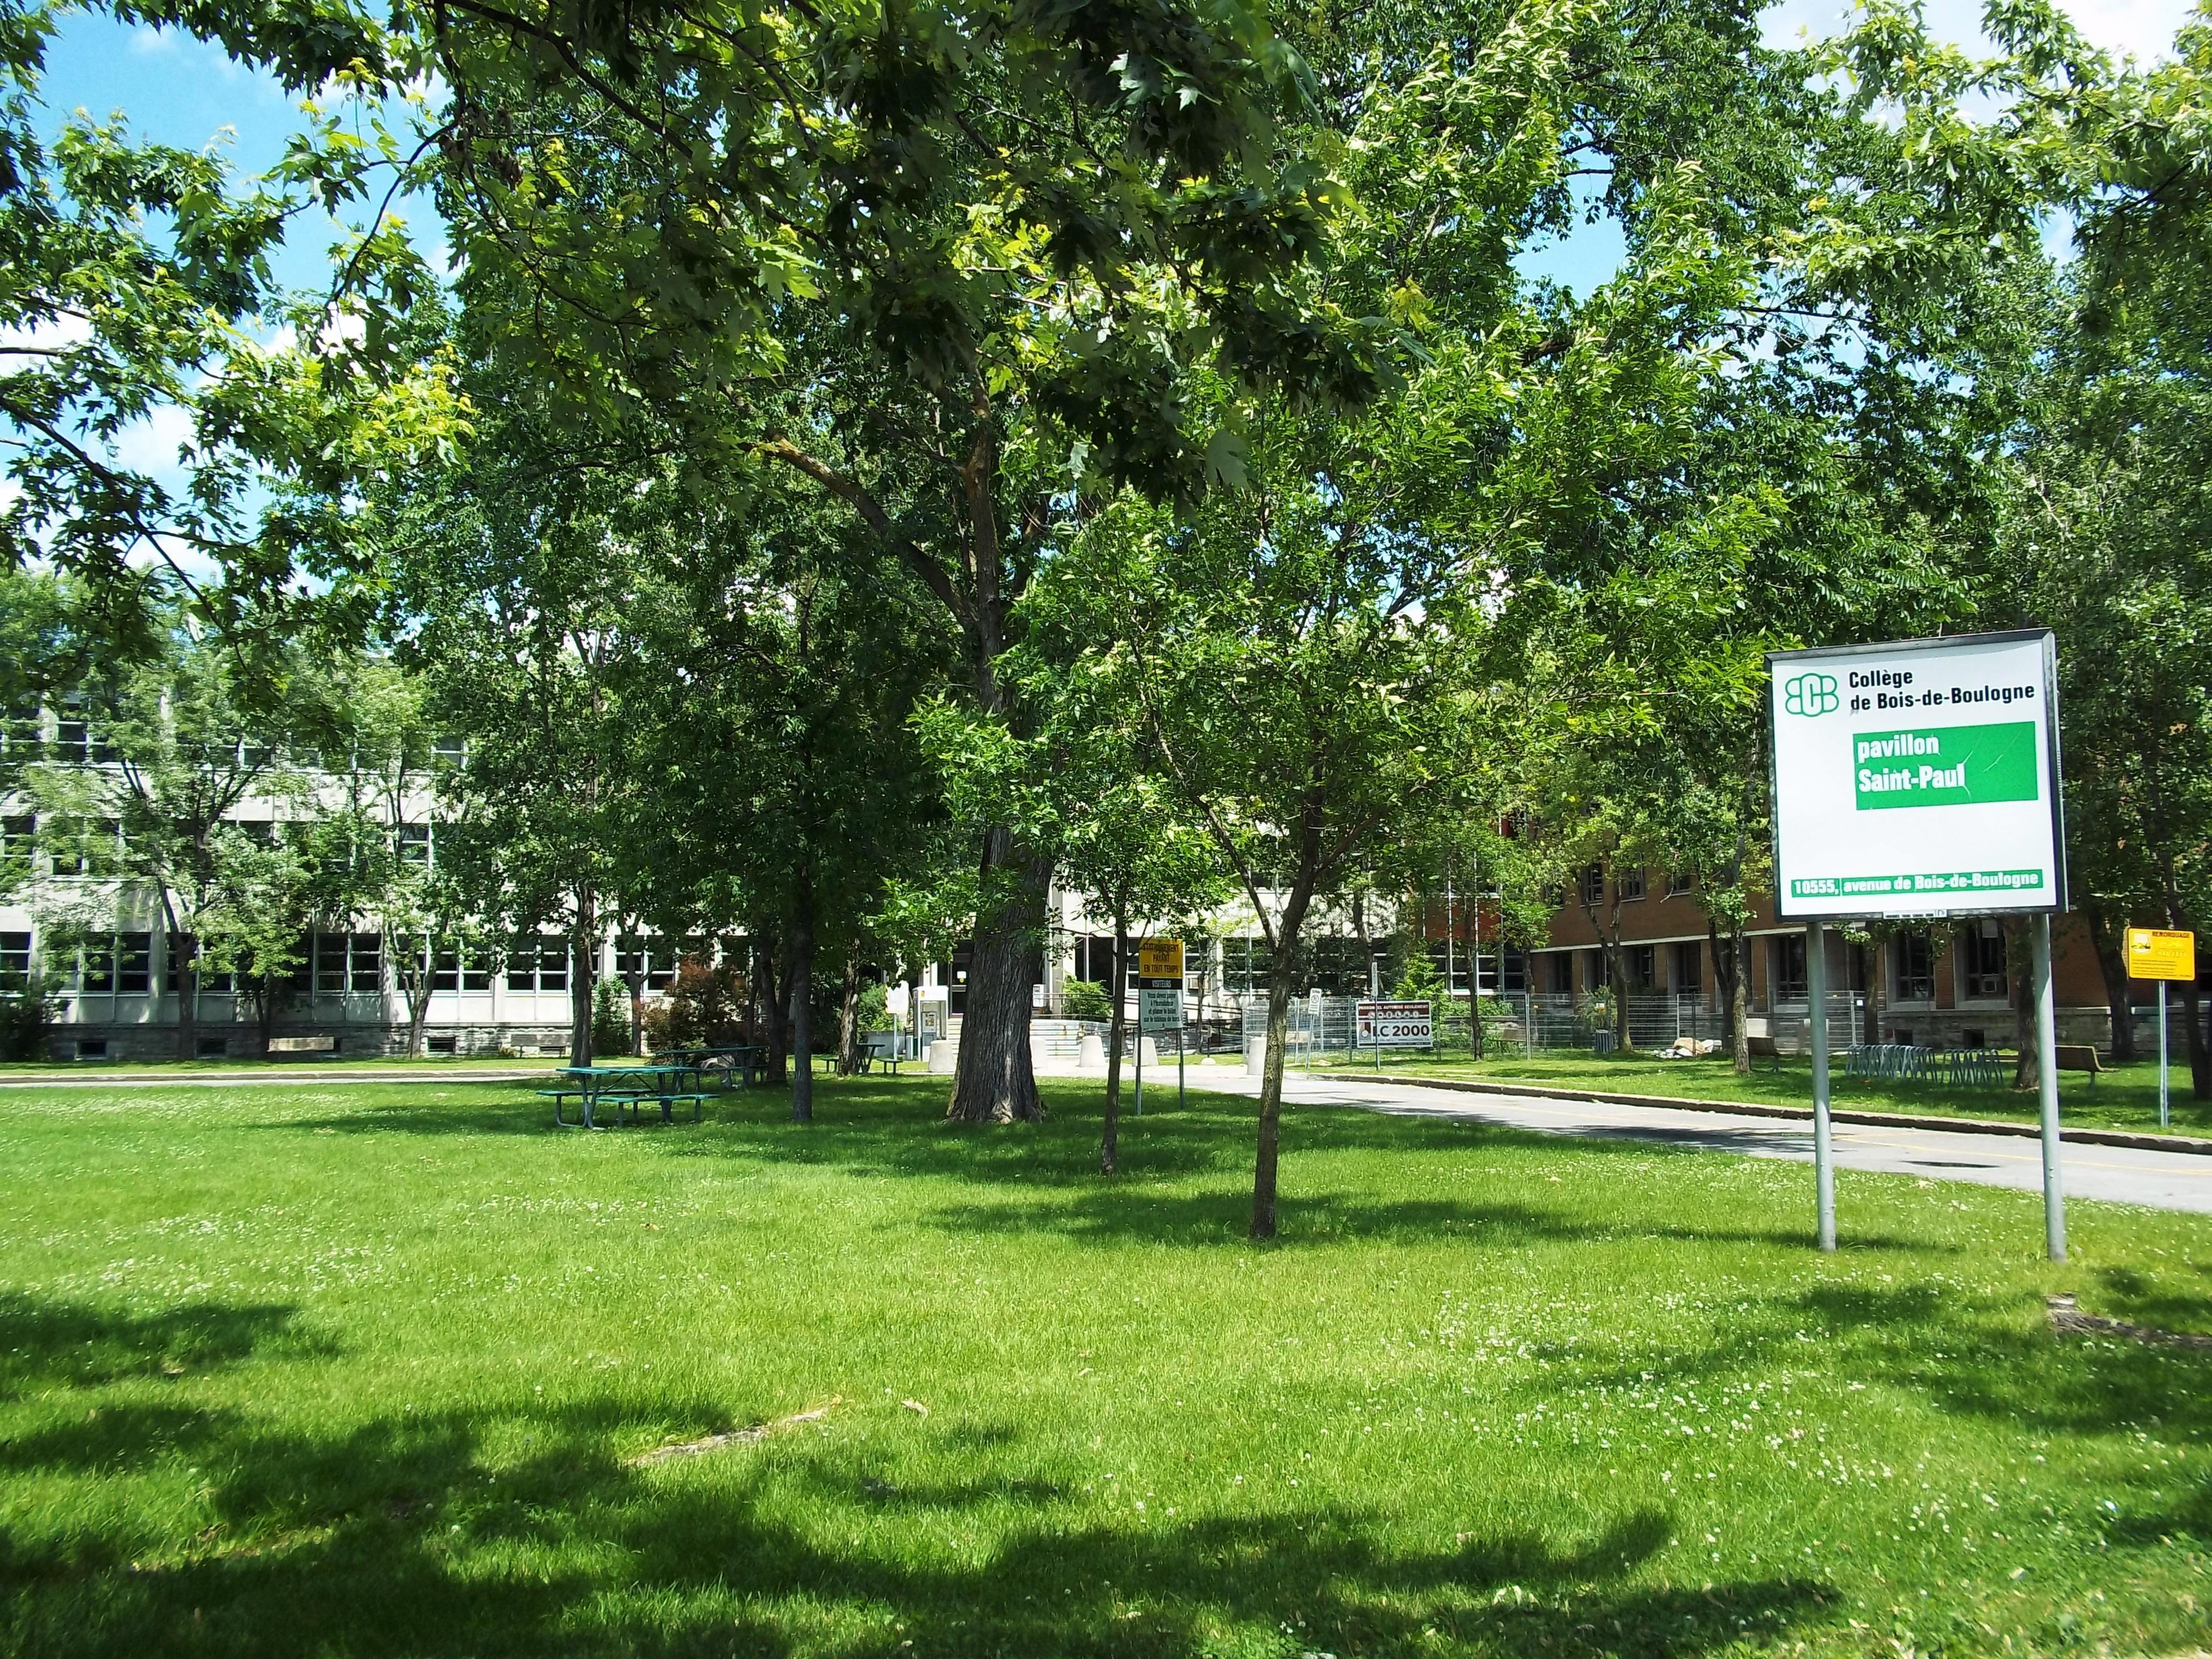 Collège de BoisdeBoulogne  Bois deBoulogne, Lebanon